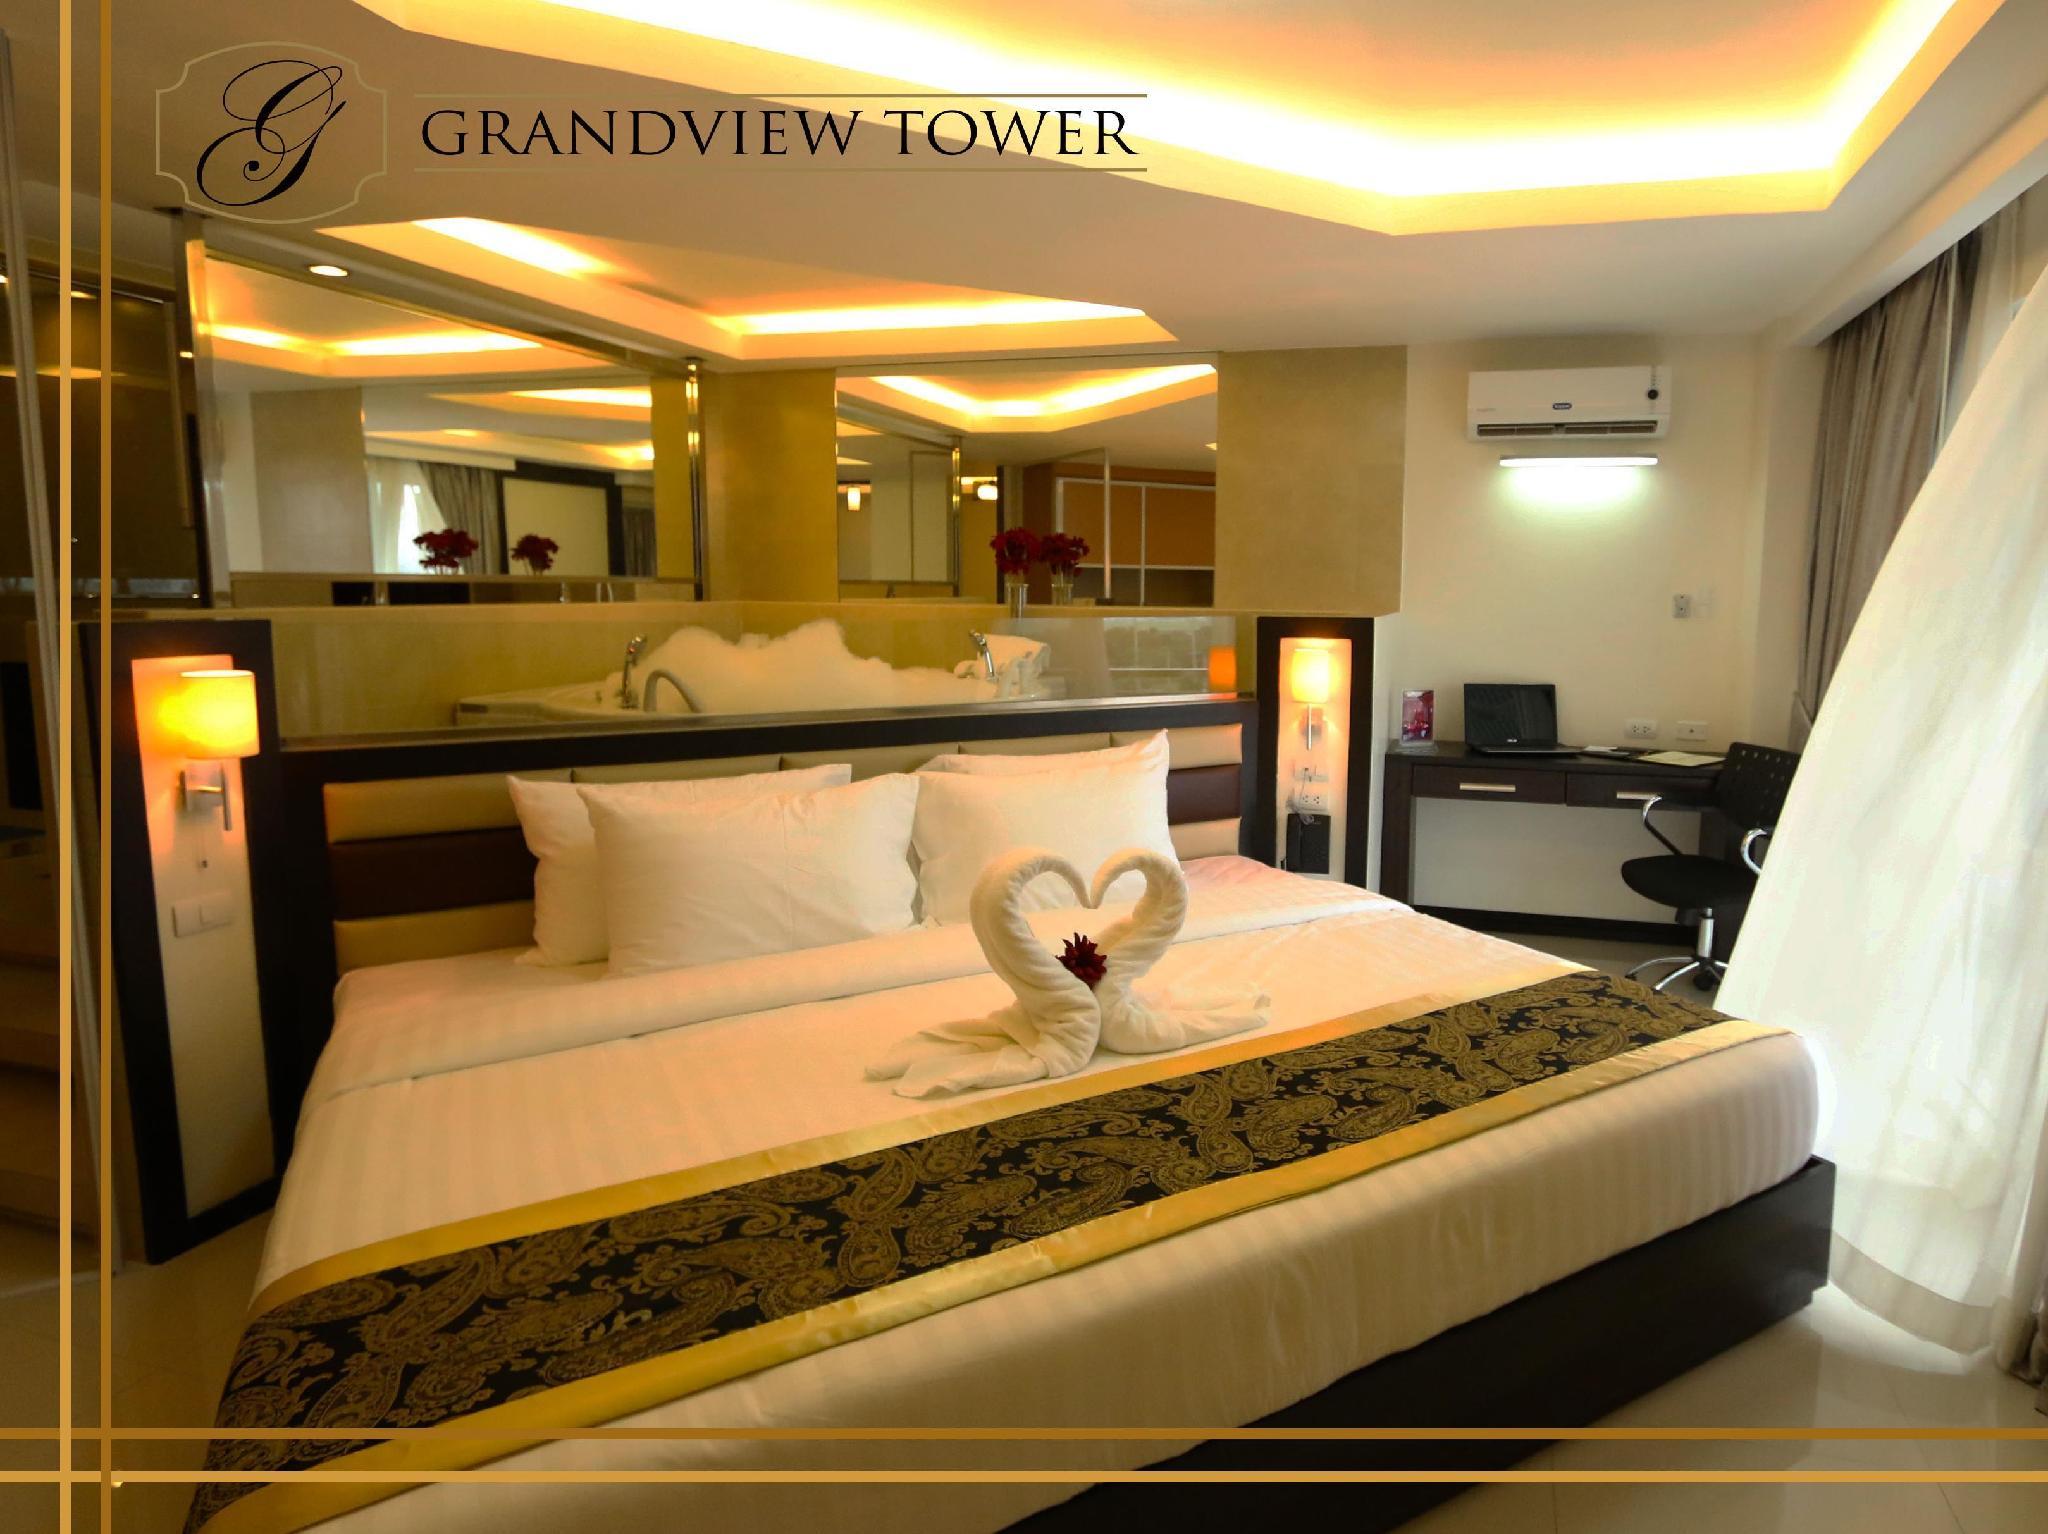 Grandview Tower Hotel